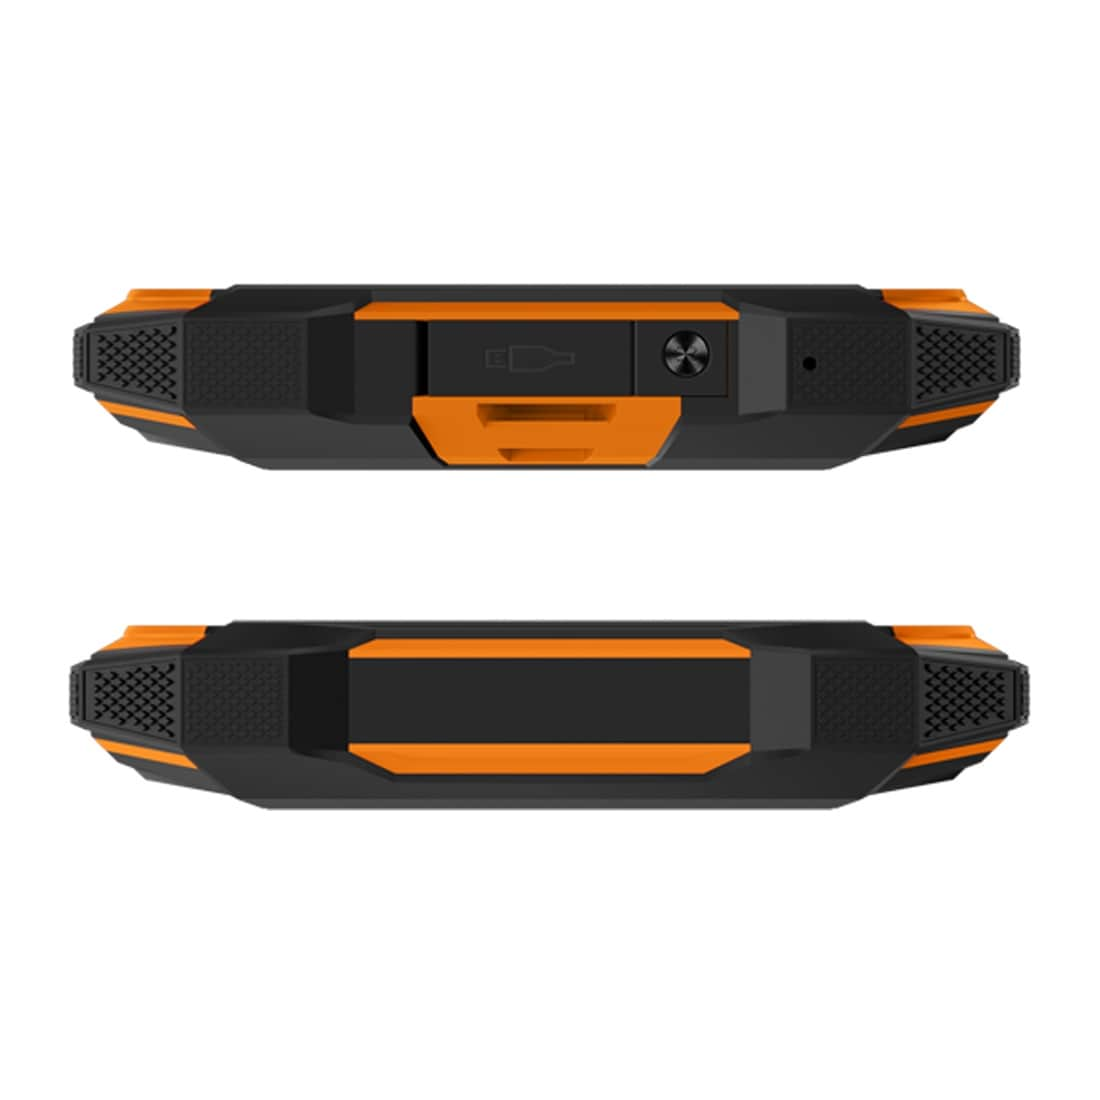 DOOGEE S88 Pro Rugged Phone, 6GB+128GB ( Orange ) - 4